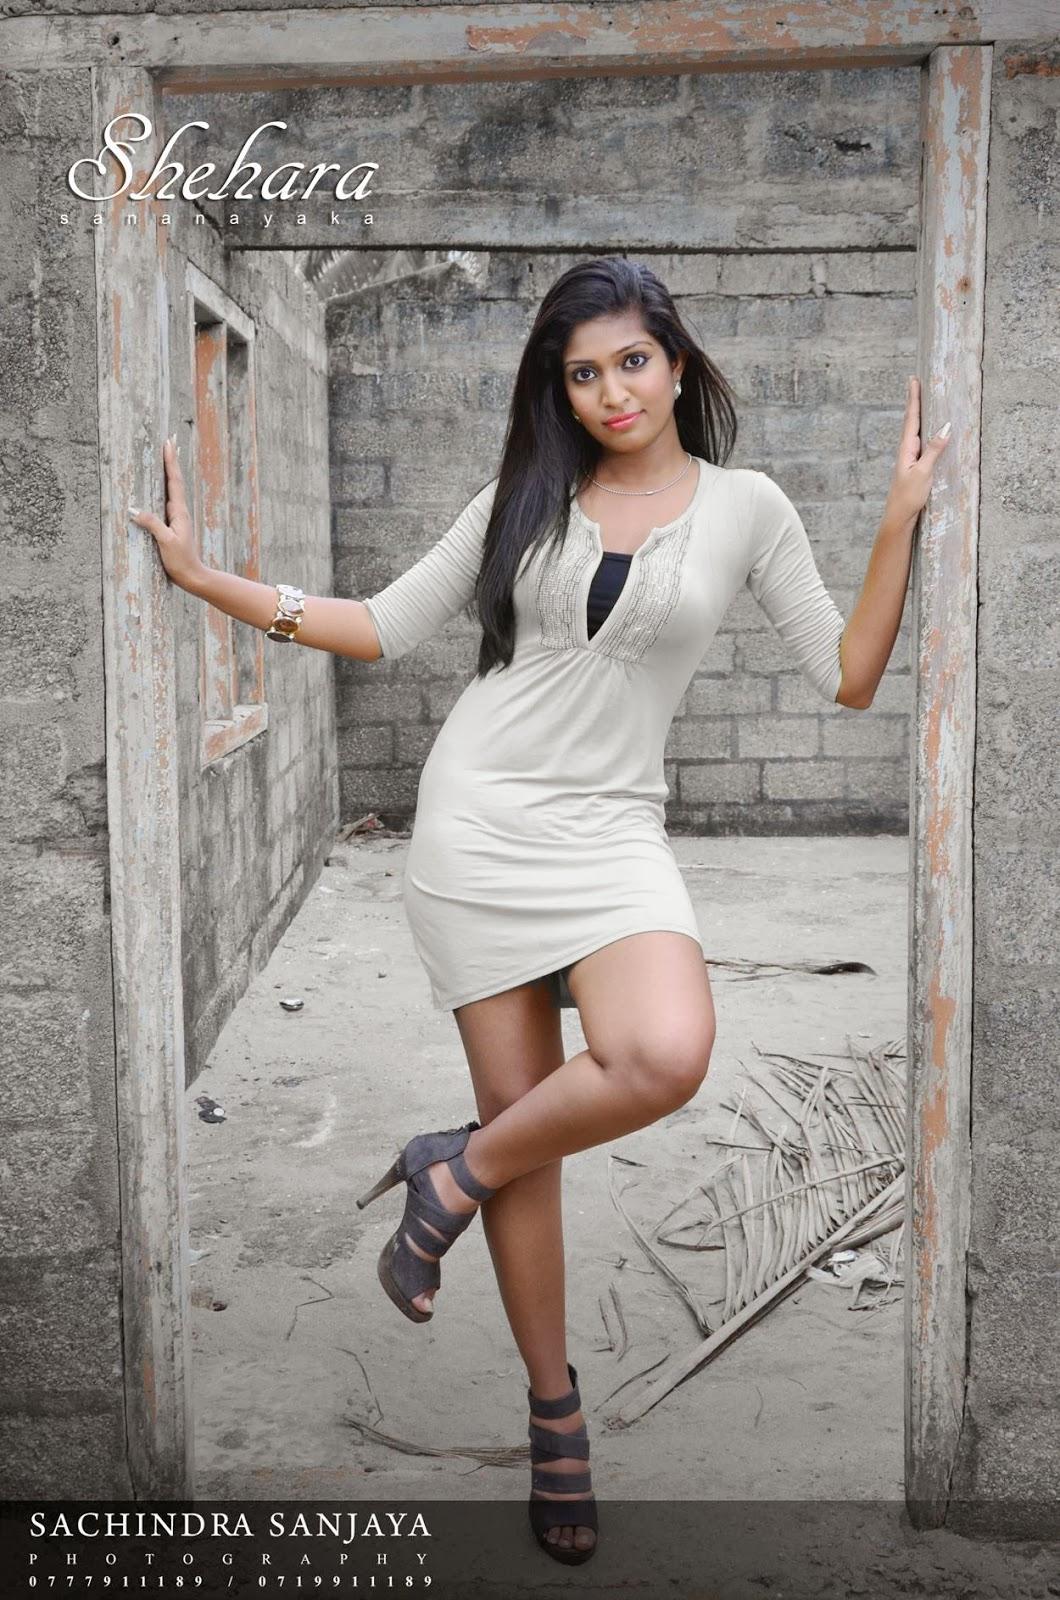 Shehara Sananayaka sexy thighs